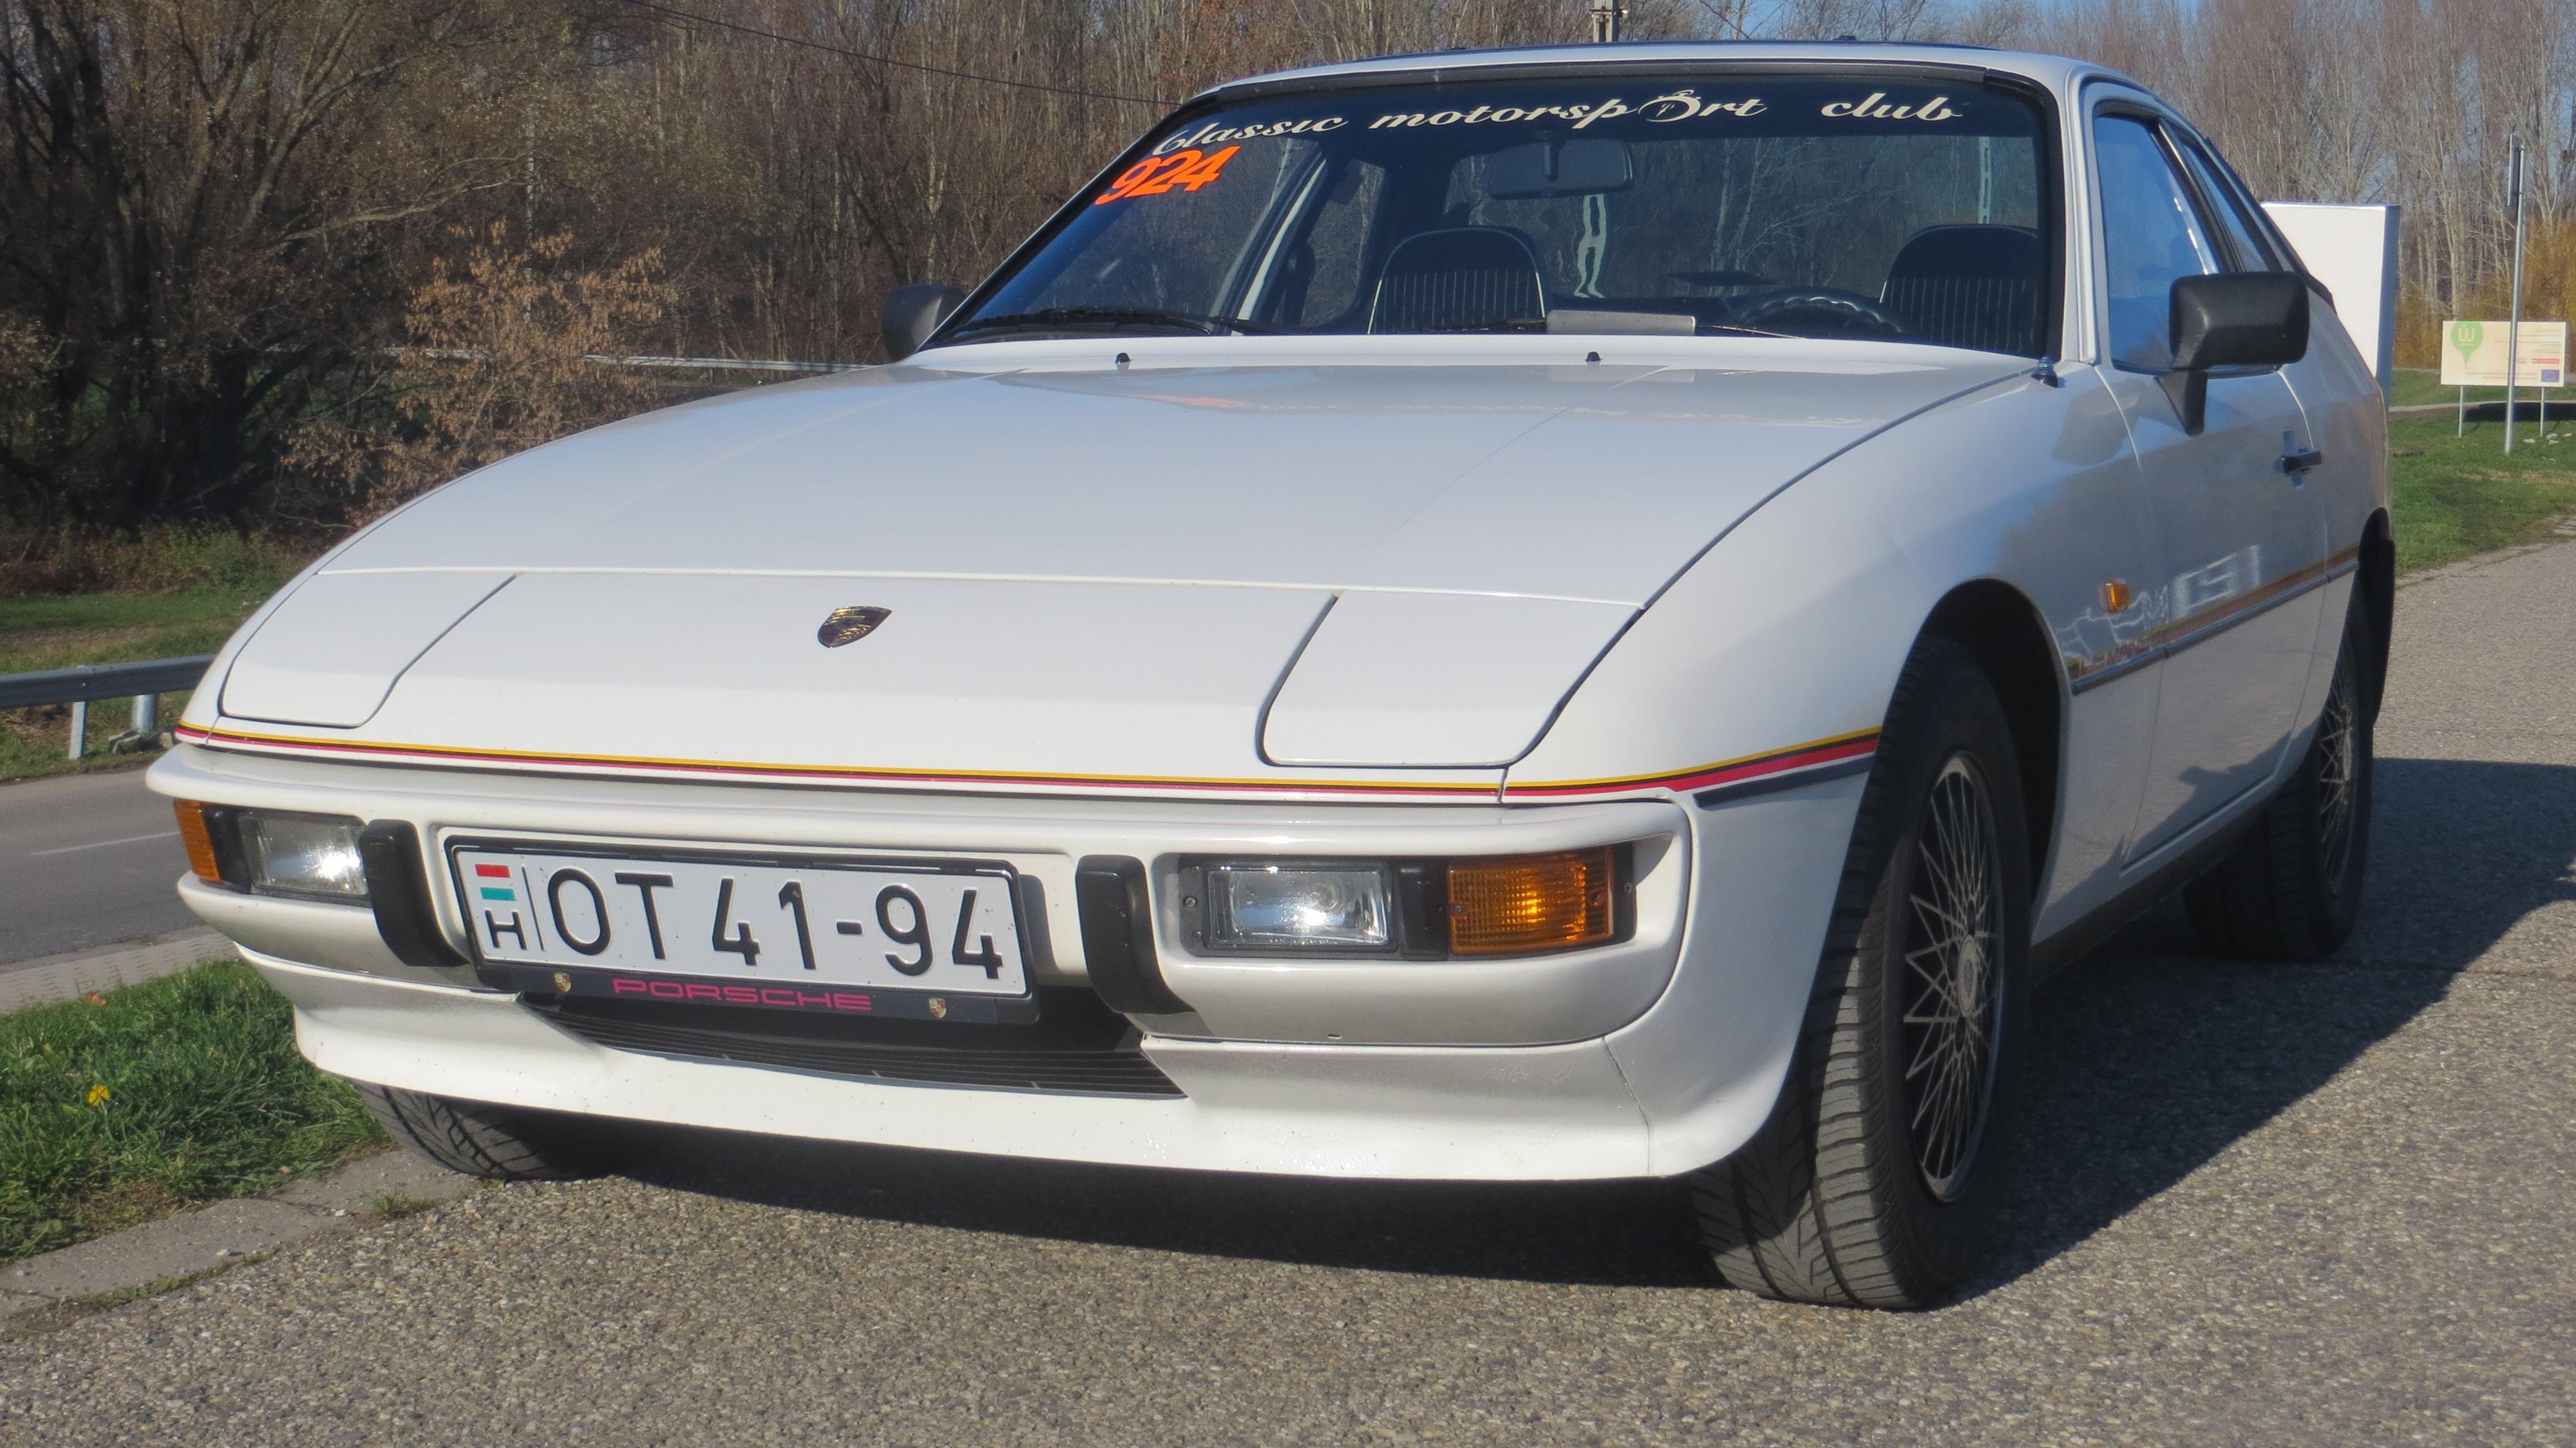 FilePorsche 924 Le Mans 01.JPG